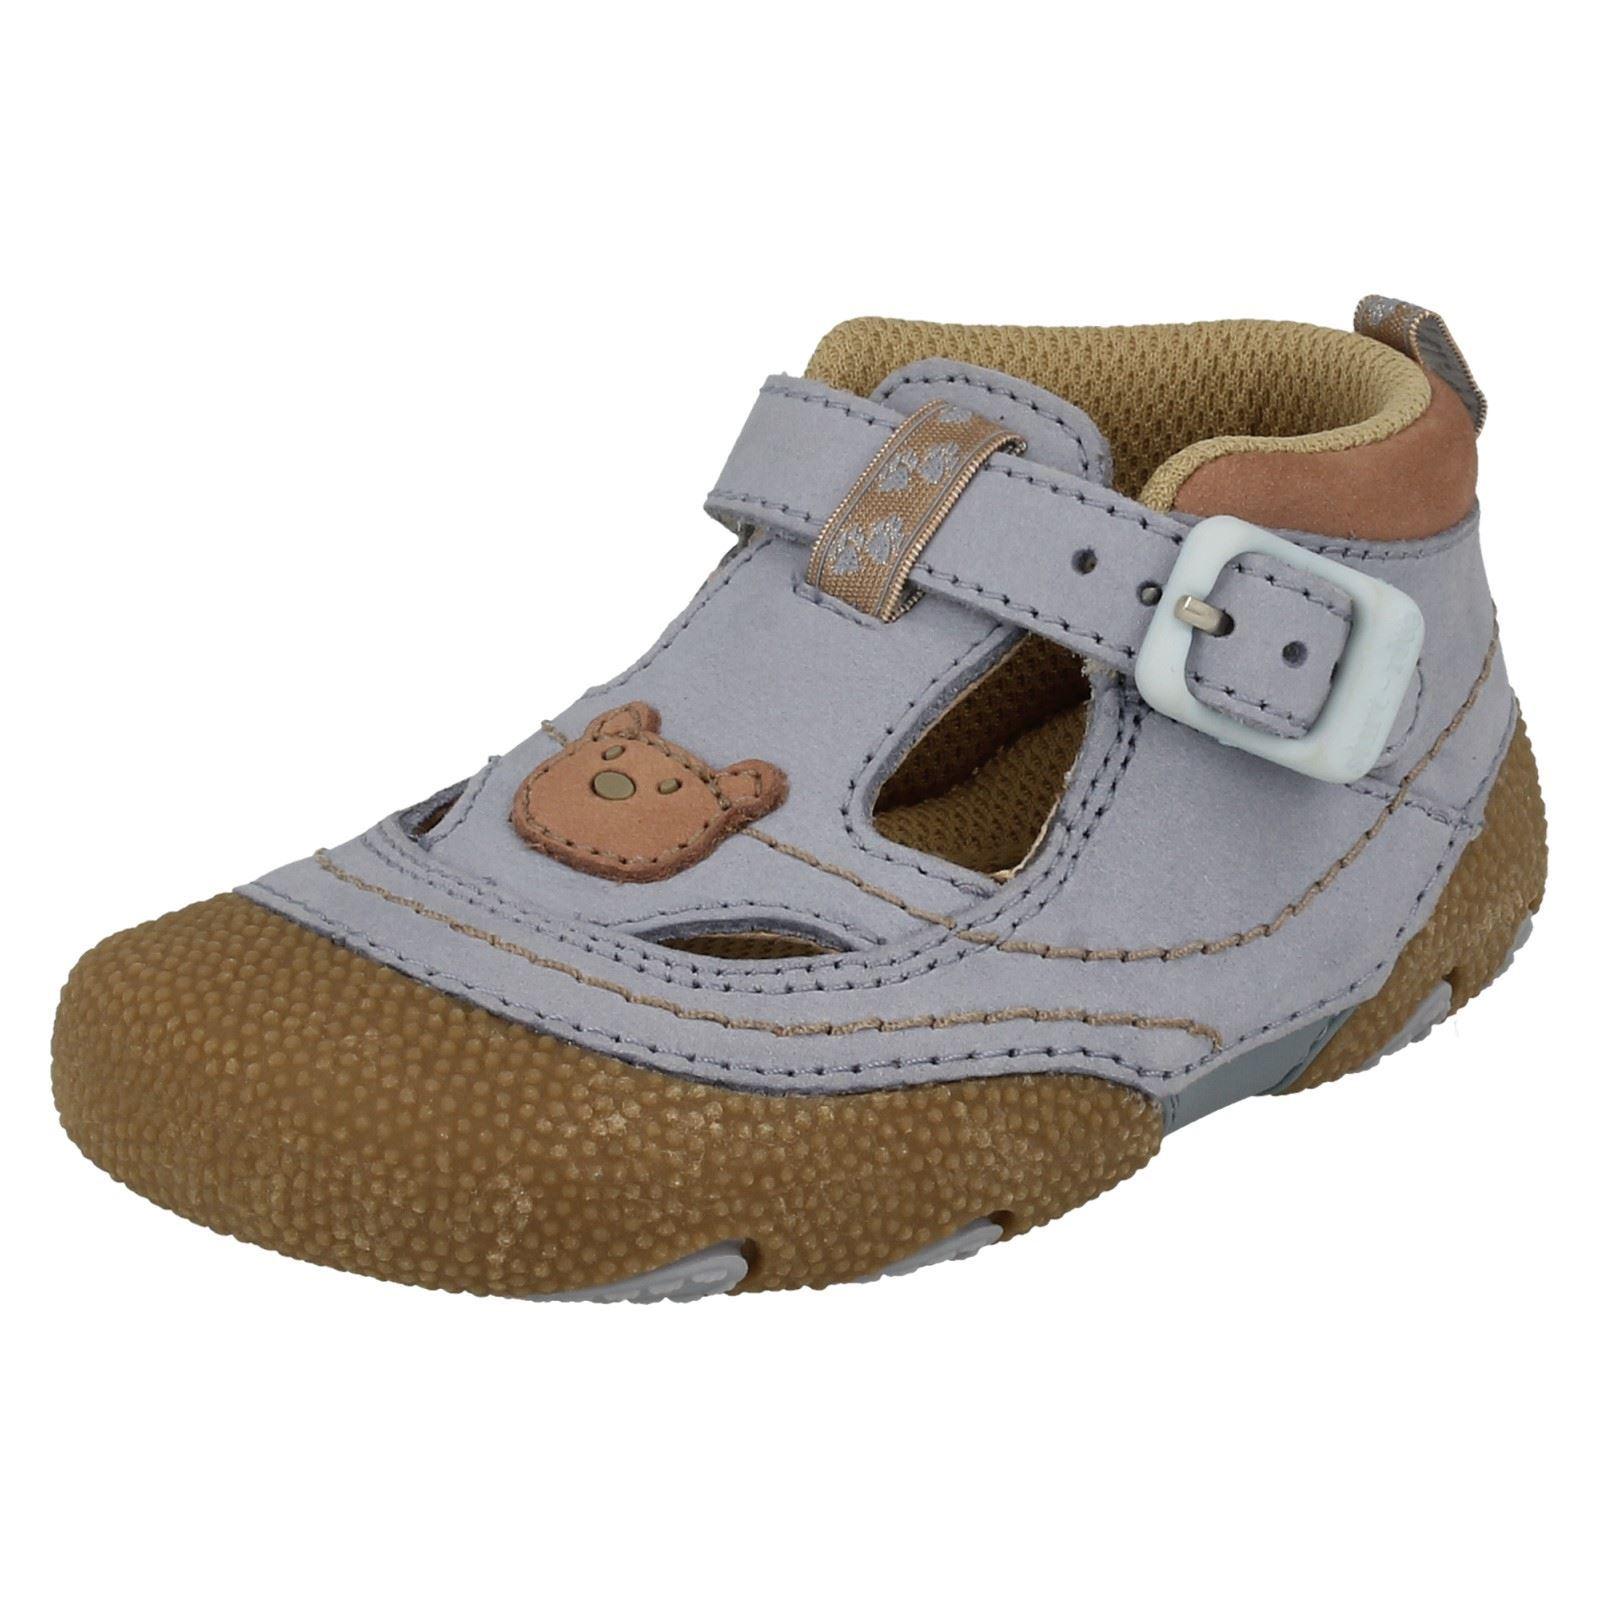 Infant Baby Boys Startrite Pre Walkers Buckle Fastening Leather